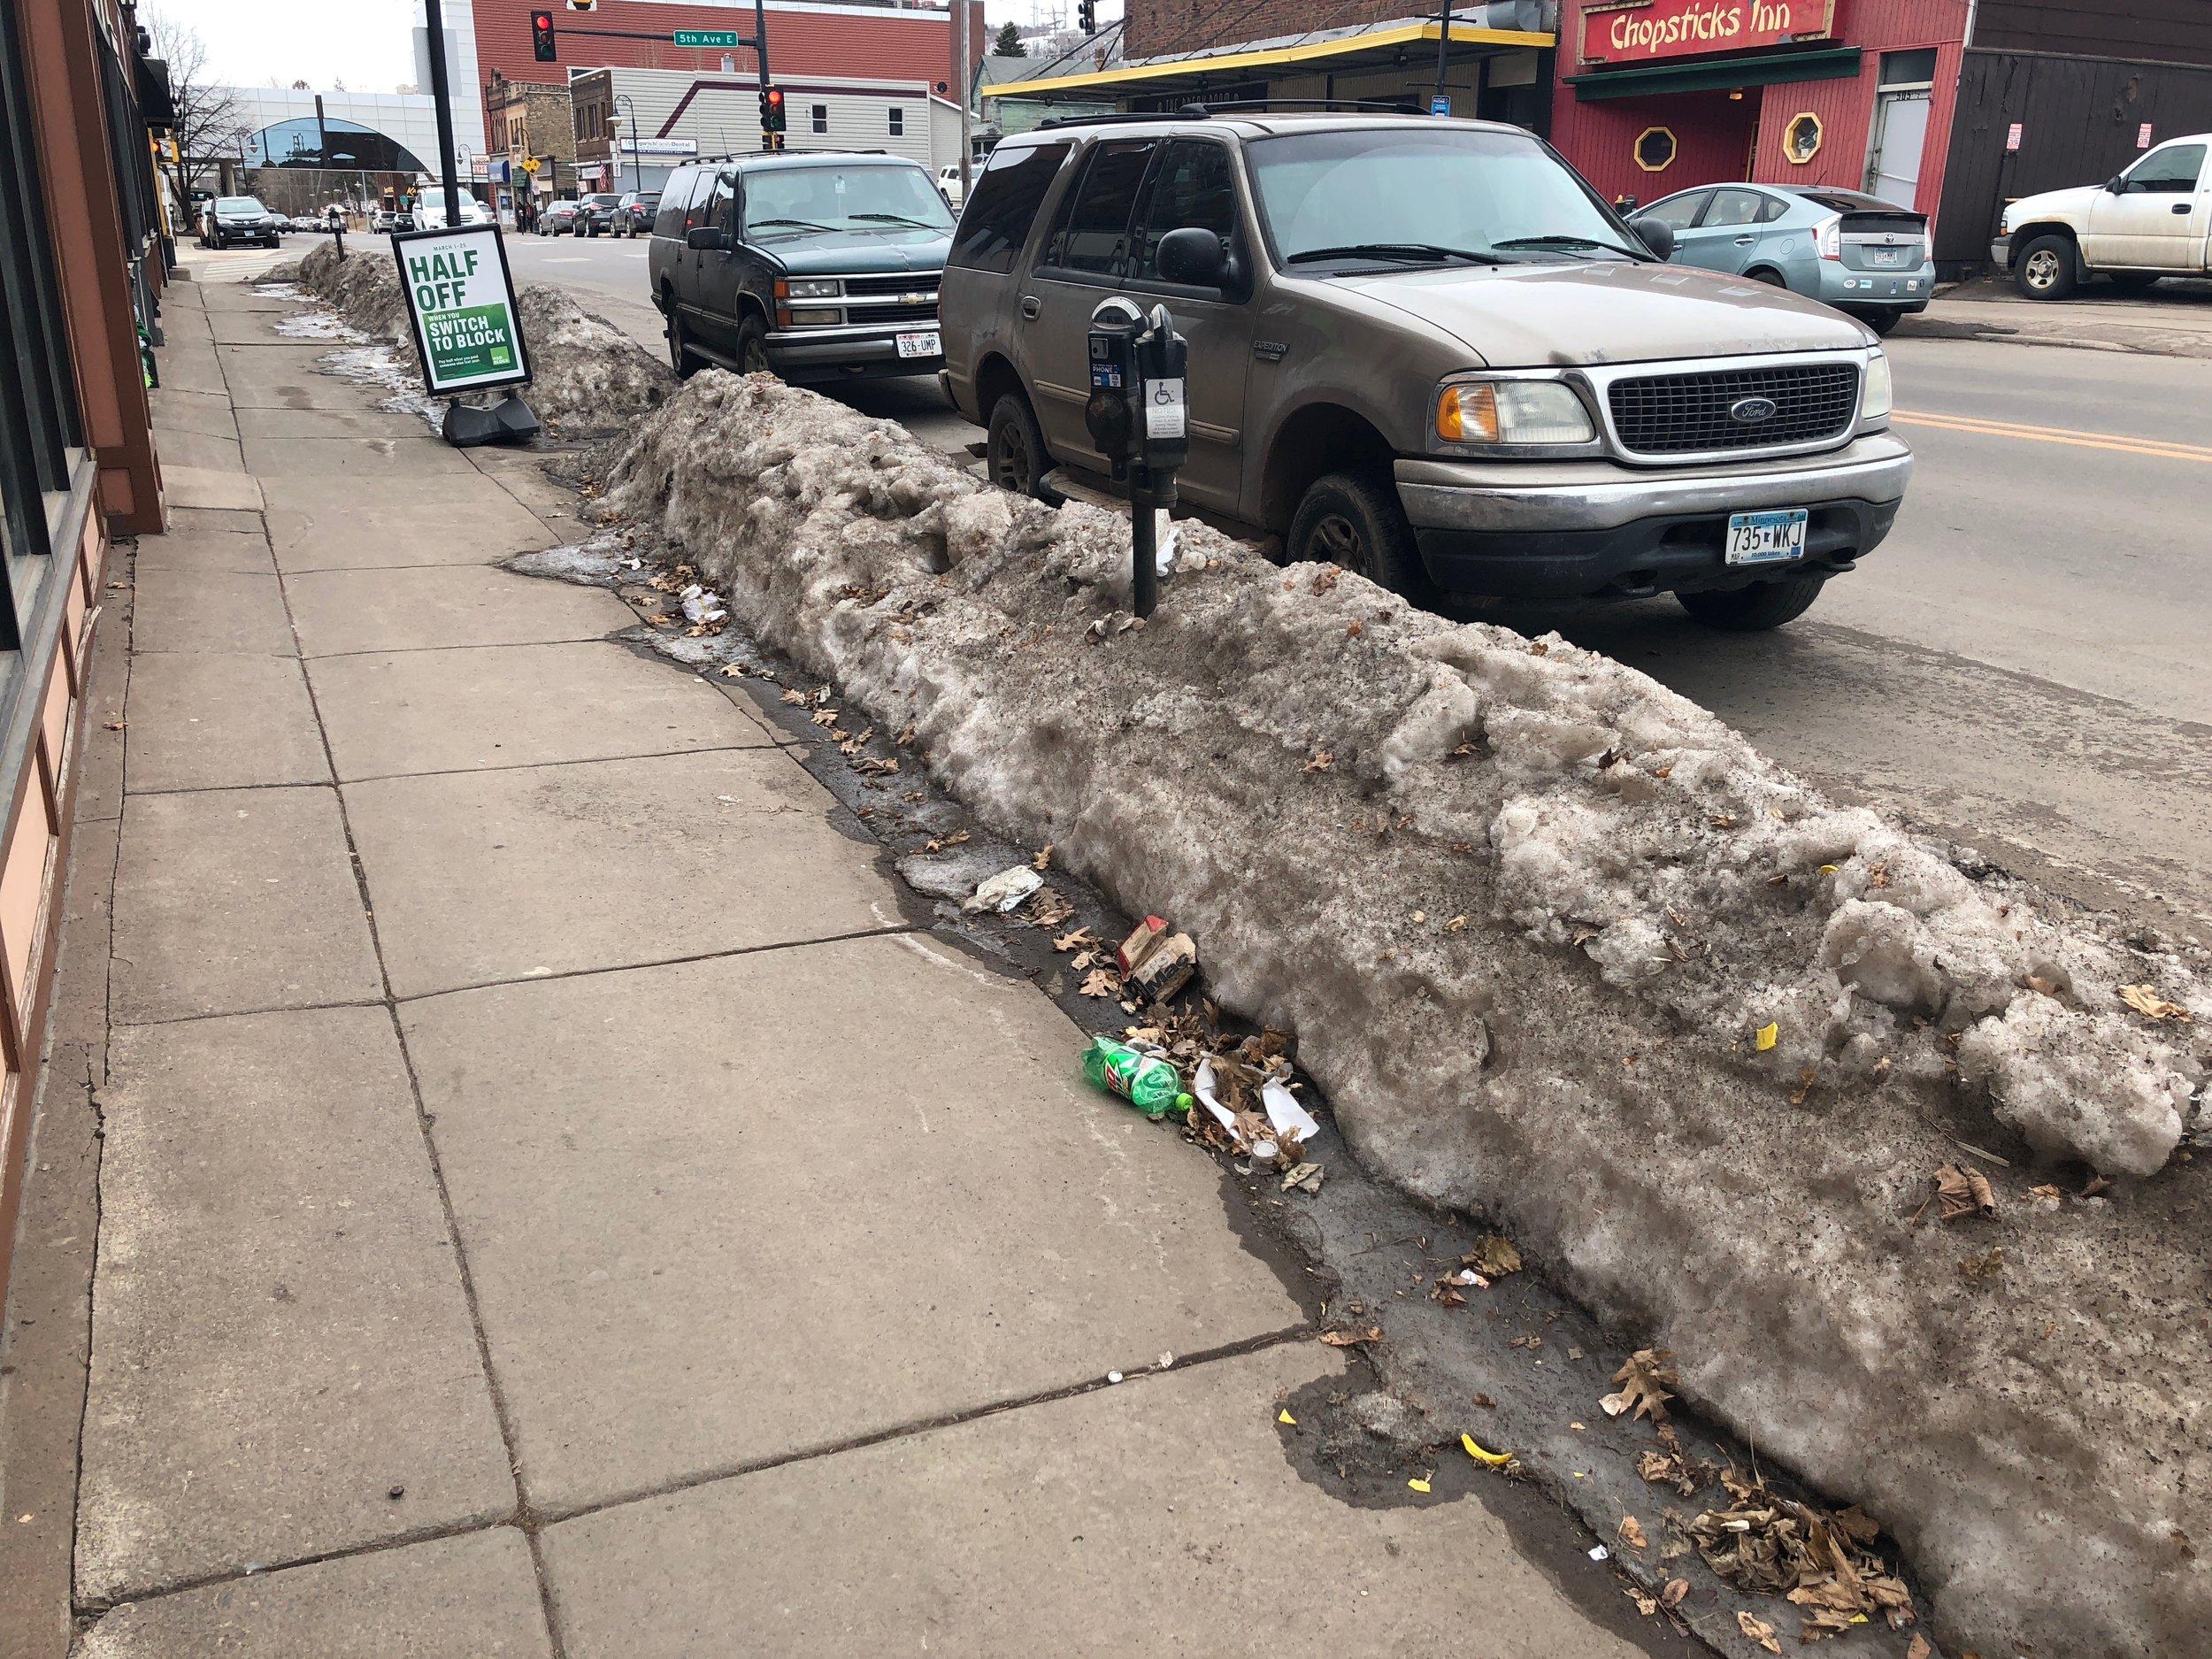 A pile of trash sits on a sidewalk along 4th street